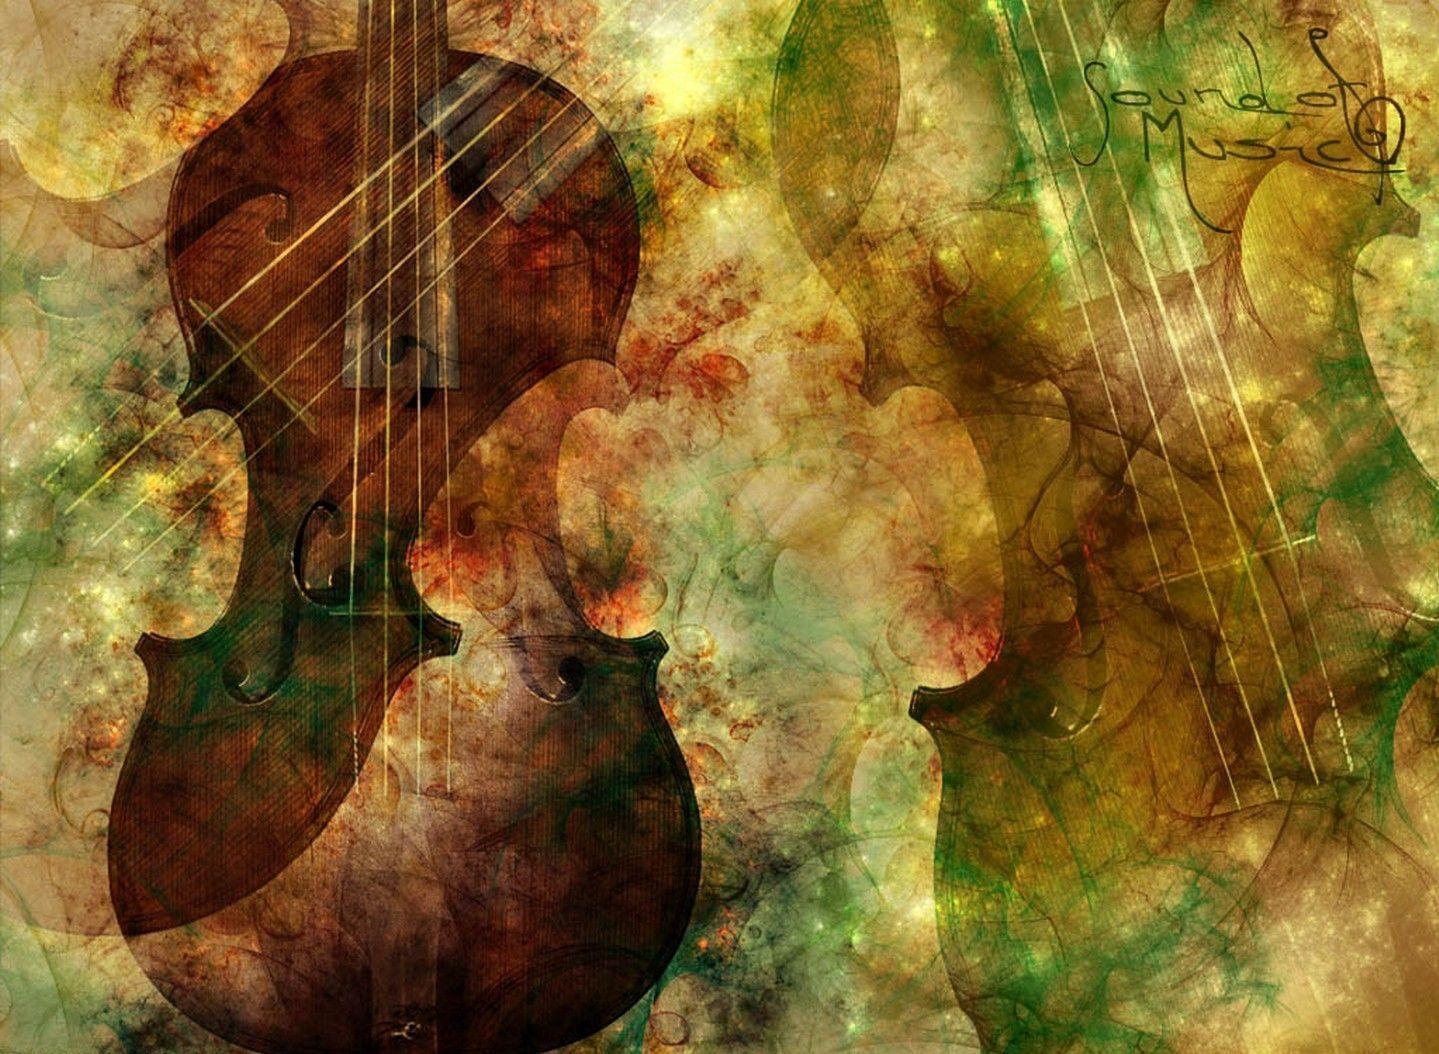 violin wallpaper – 1439×1054 High Definition Wallpaper, Background ...